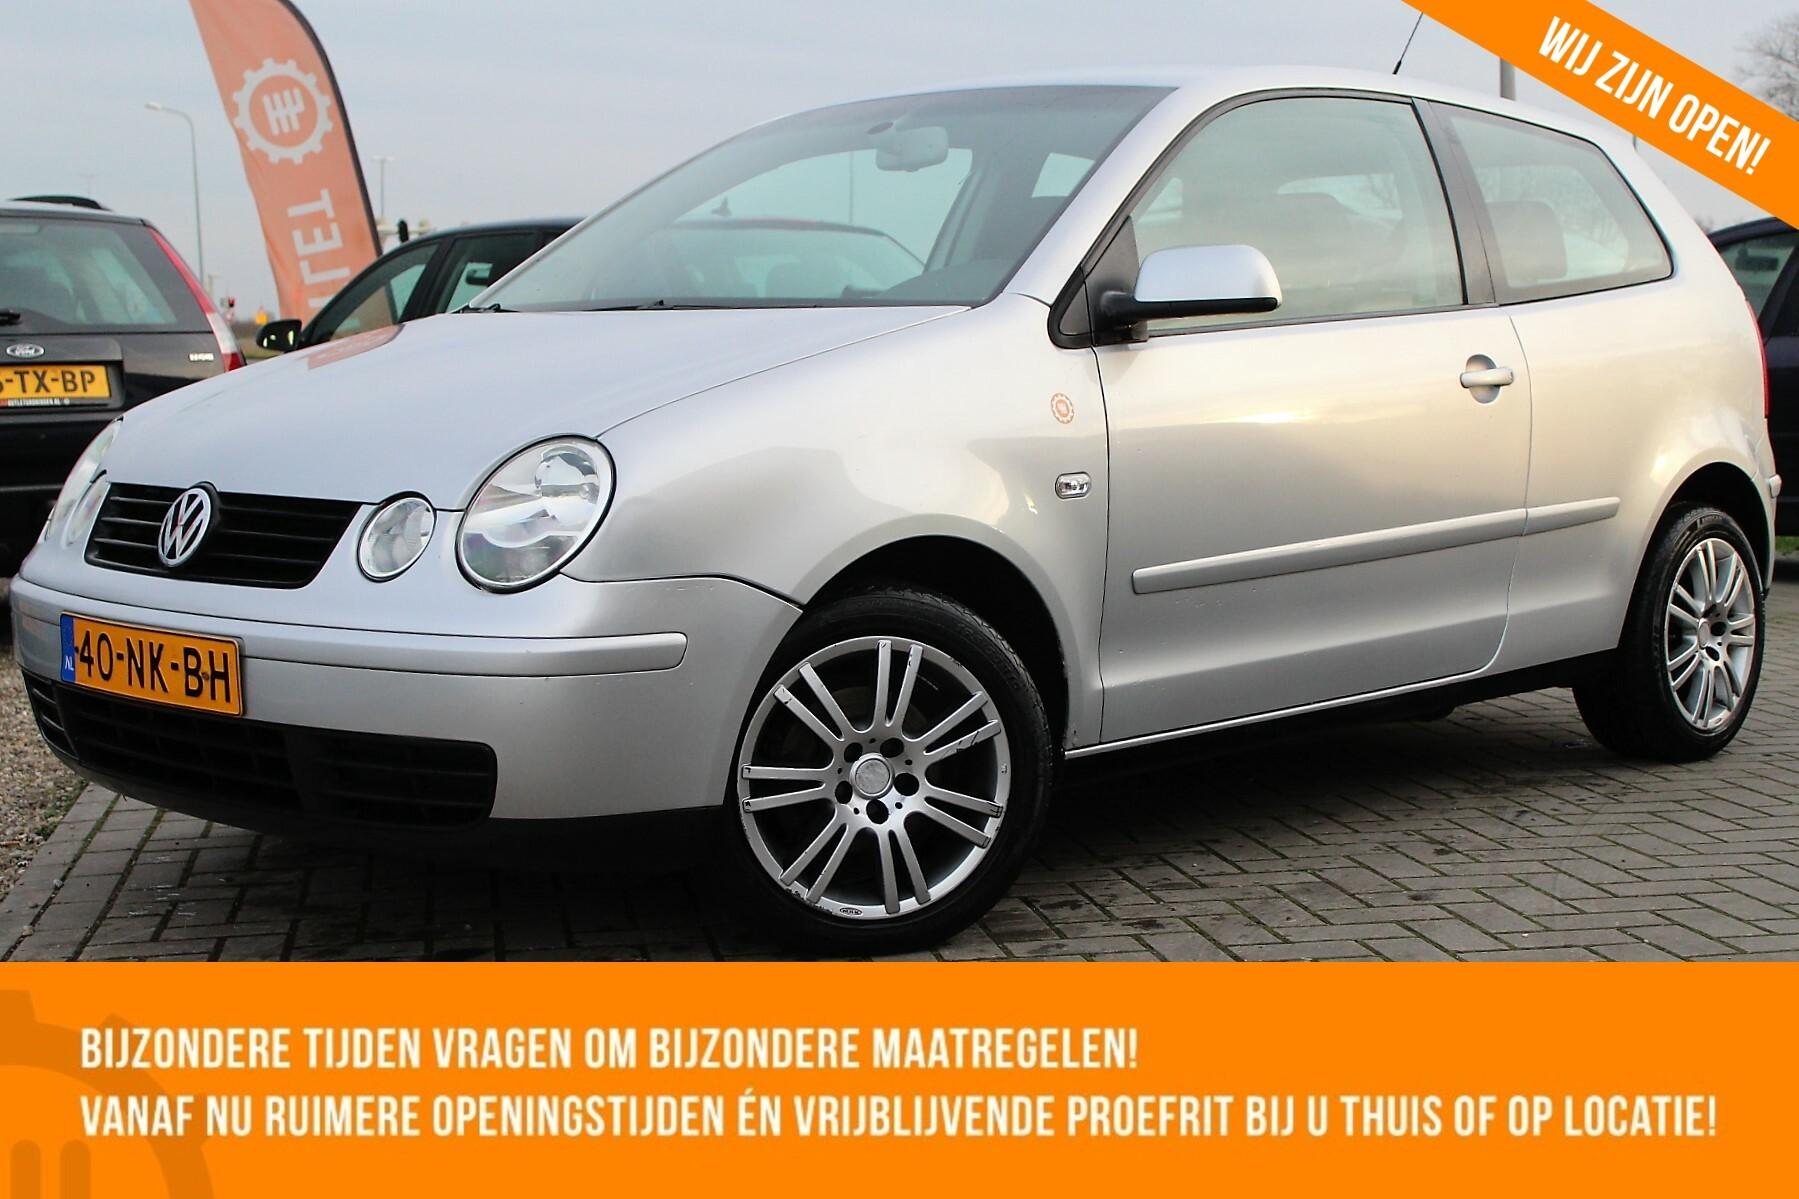 Caroutlet Groningen - Volkswagen Polo 1.4-16V Comfortline   AIRCO   ELEK PAKKET   CRUISE